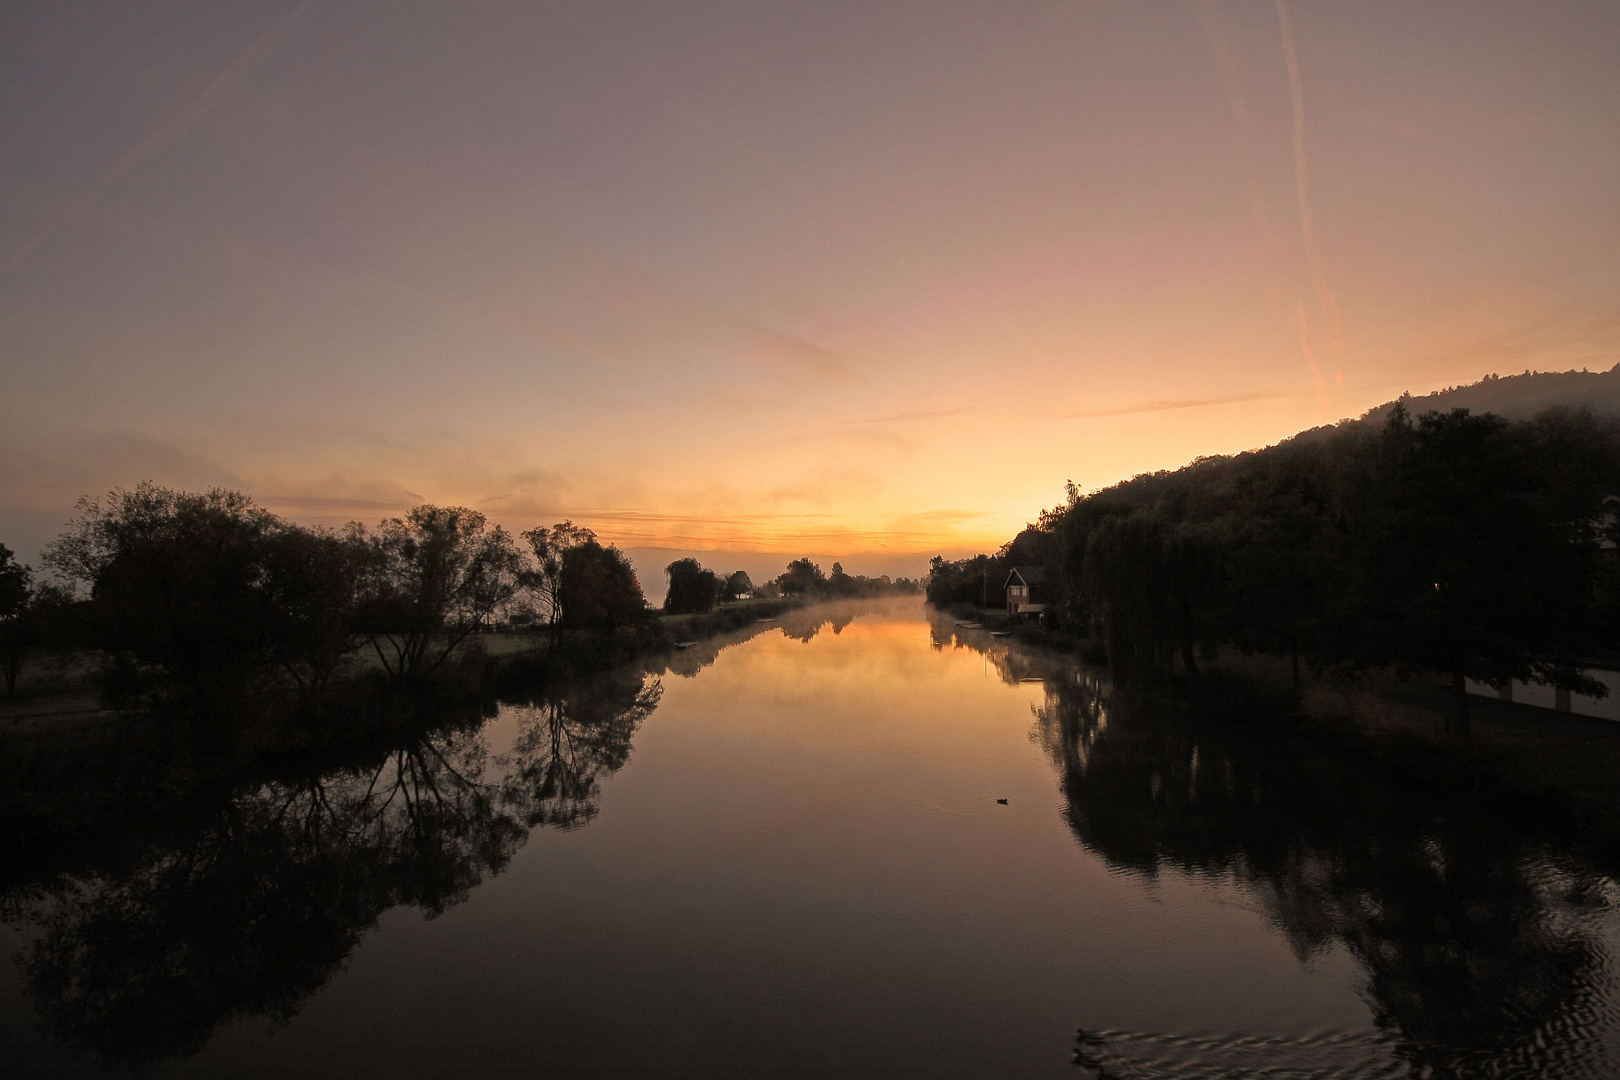 Sonnenaufgang an der Werra in Eschwege